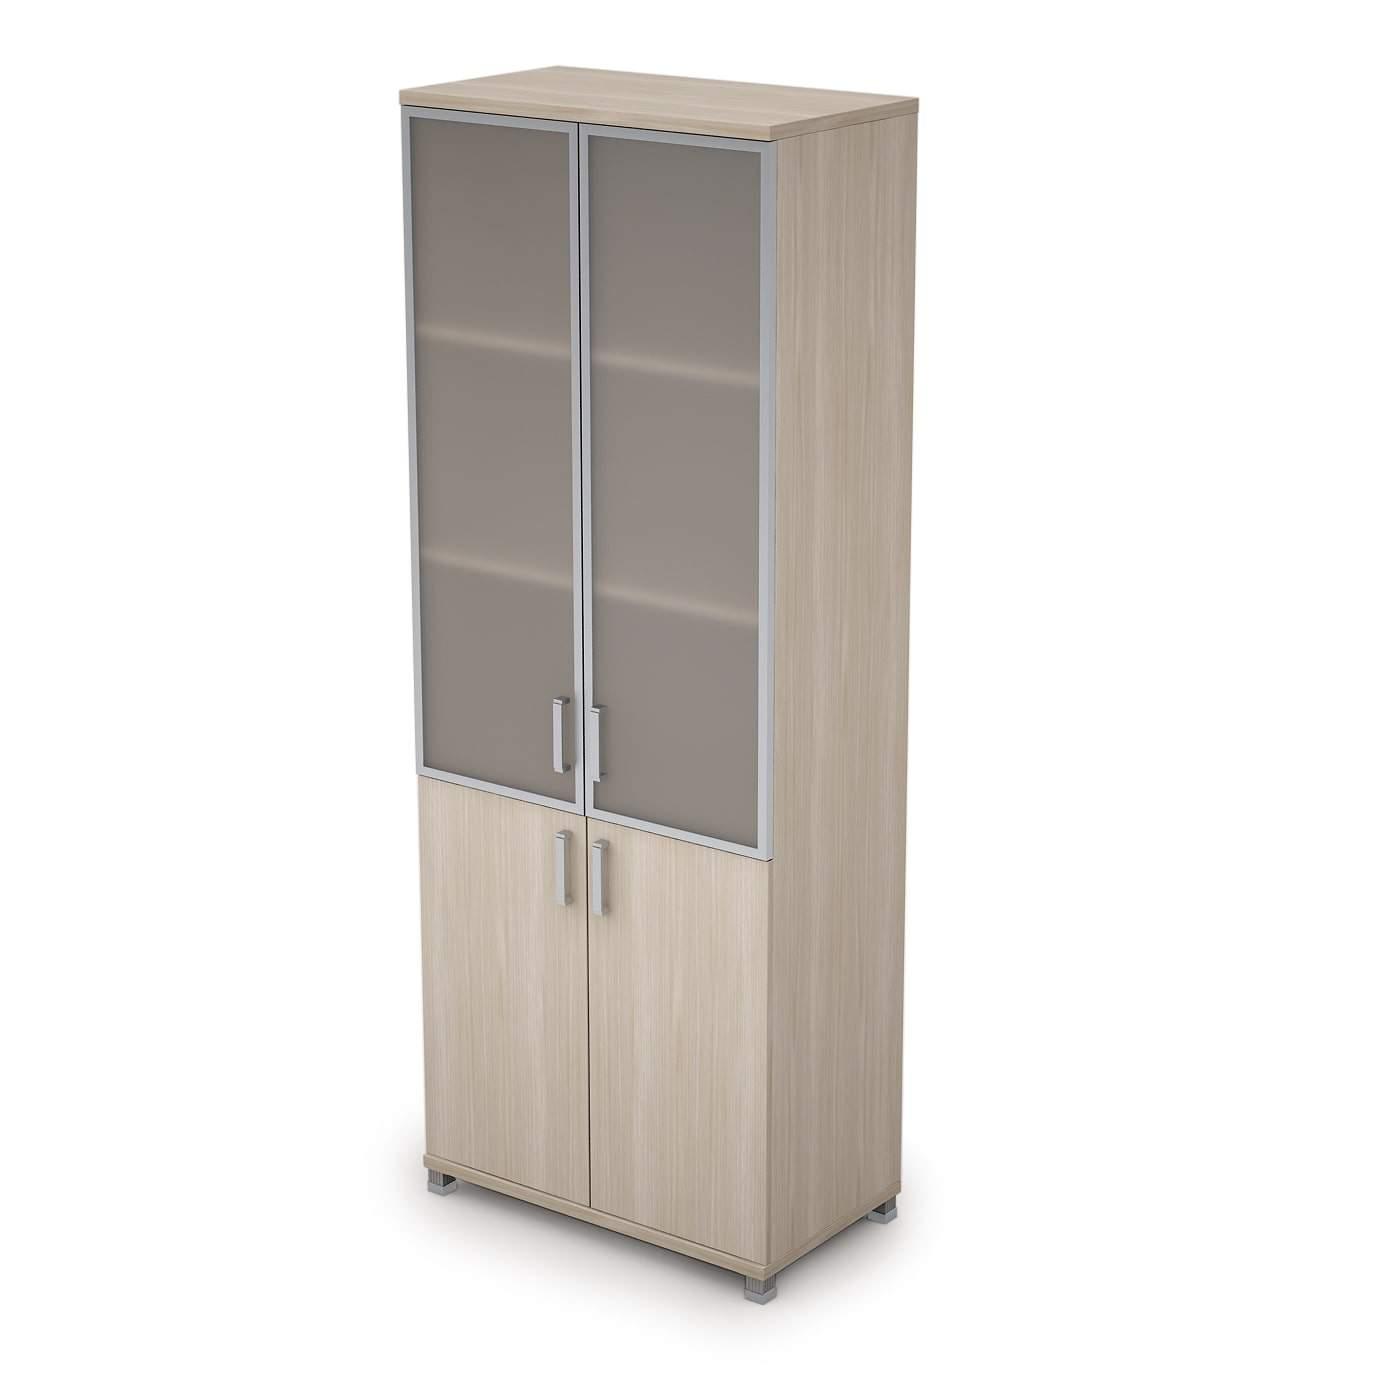 Шкаф комбинированный 800x450x2116